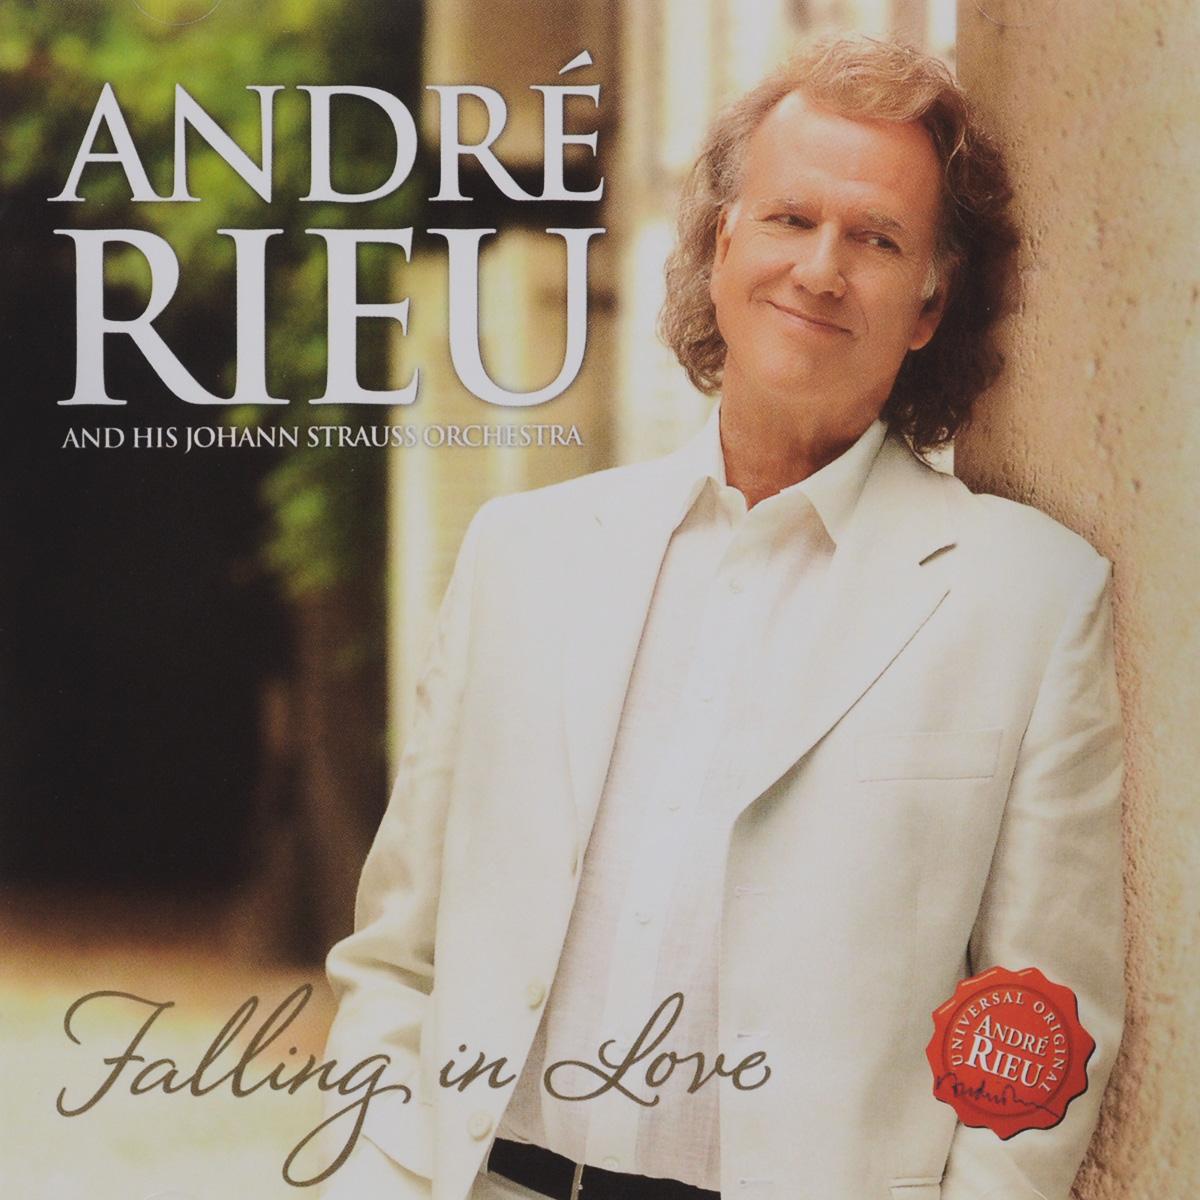 Андрэ Рье,Johann Strauss Orchestra Andre Rieu. Falling In Love